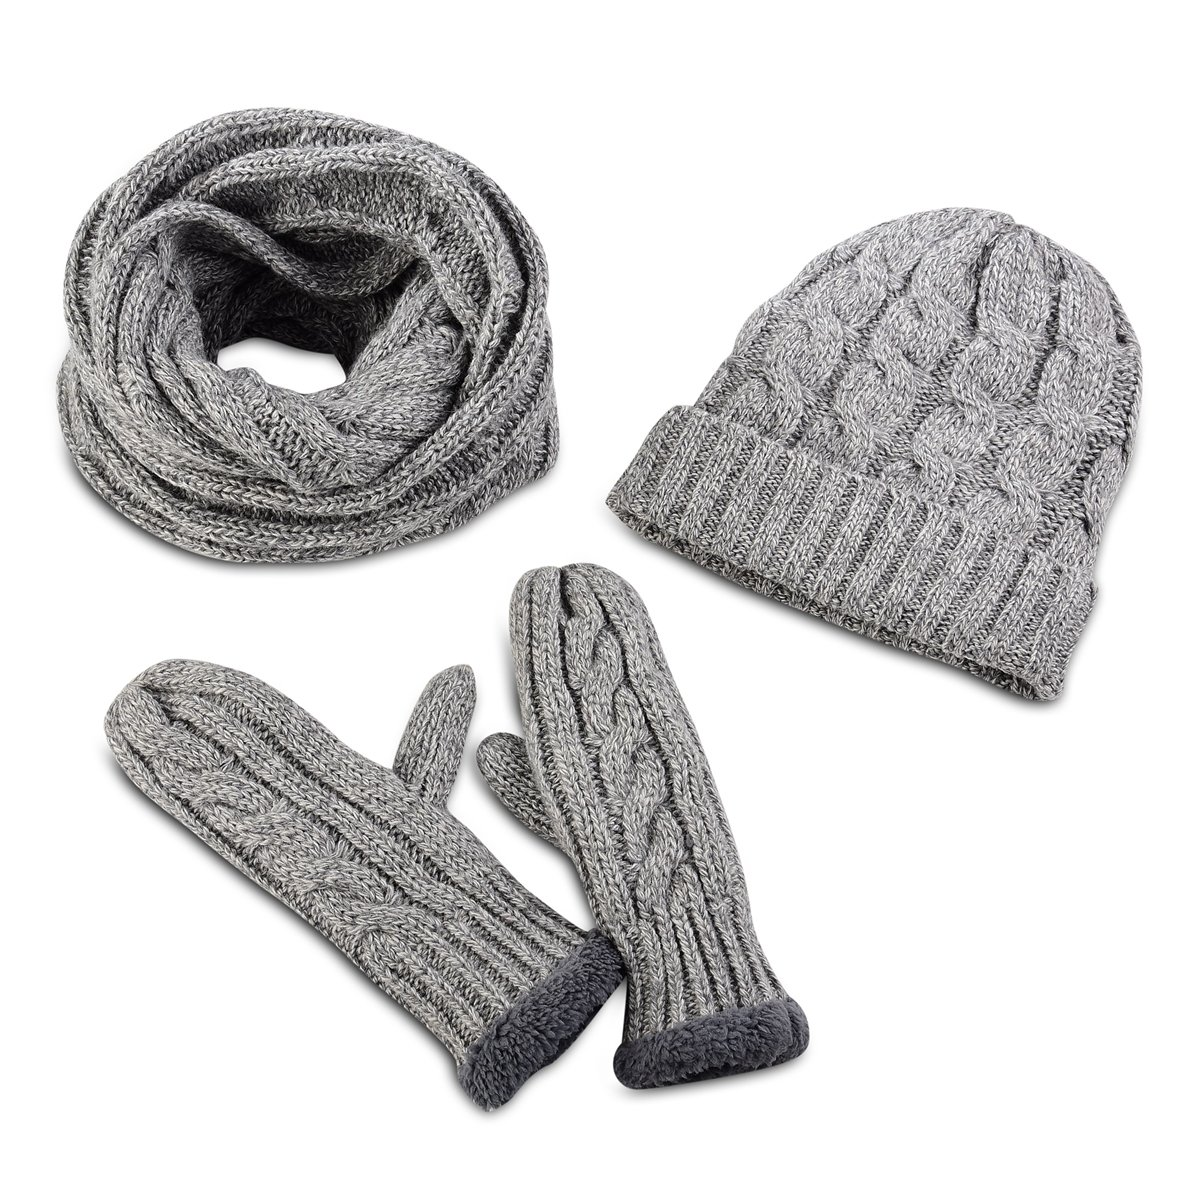 eaf9d5b3d76 Get Quotations · Secret Felicity 3pcs Soft Warm Thick Knitted Hat Gloves    Scarf Winter Set